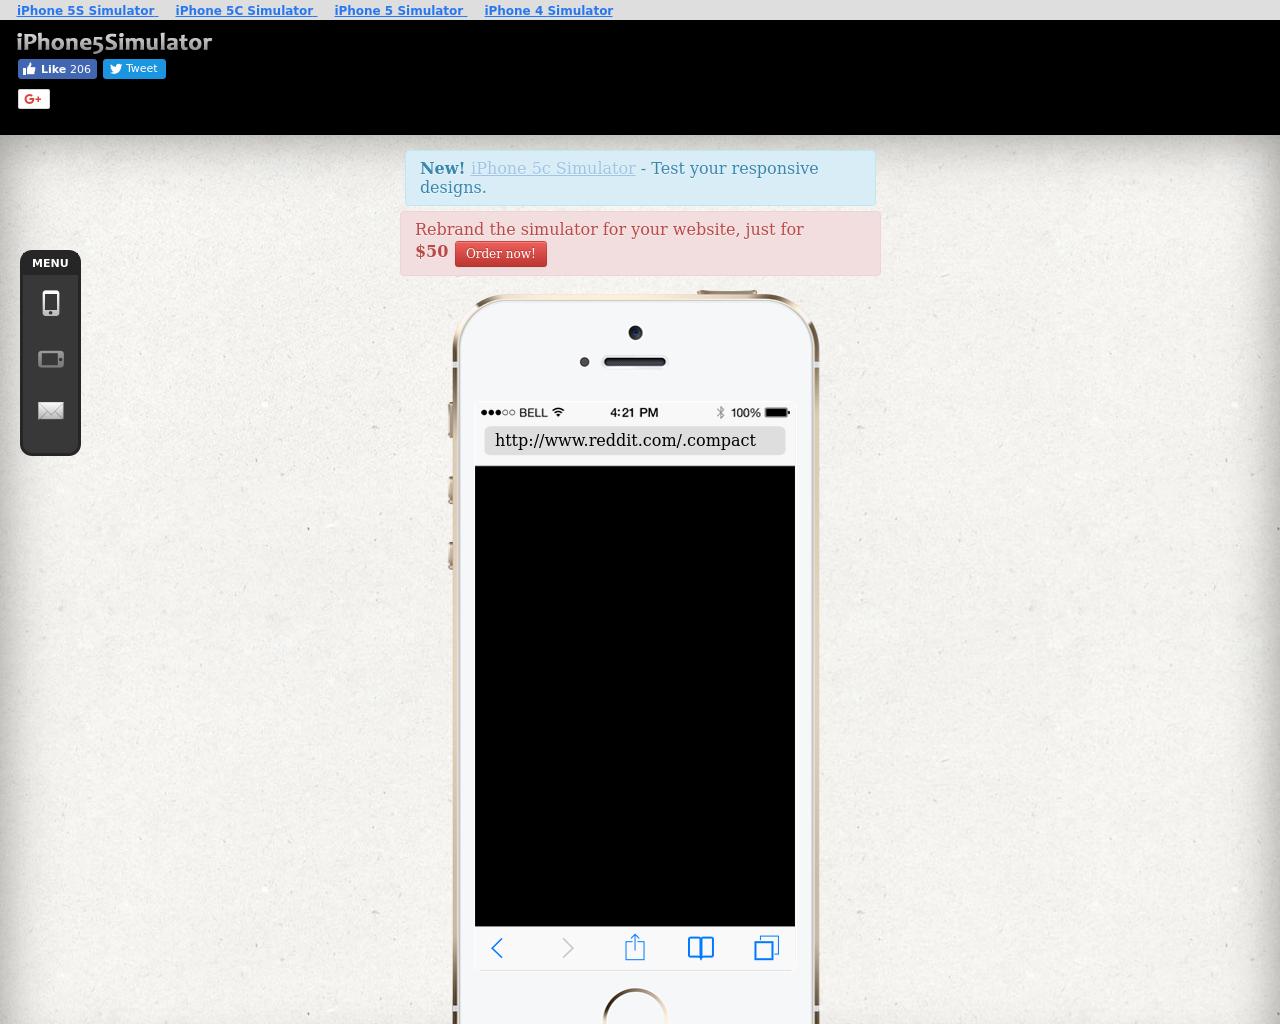 IPhone-5-Simulator-Advertising-Reviews-Pricing